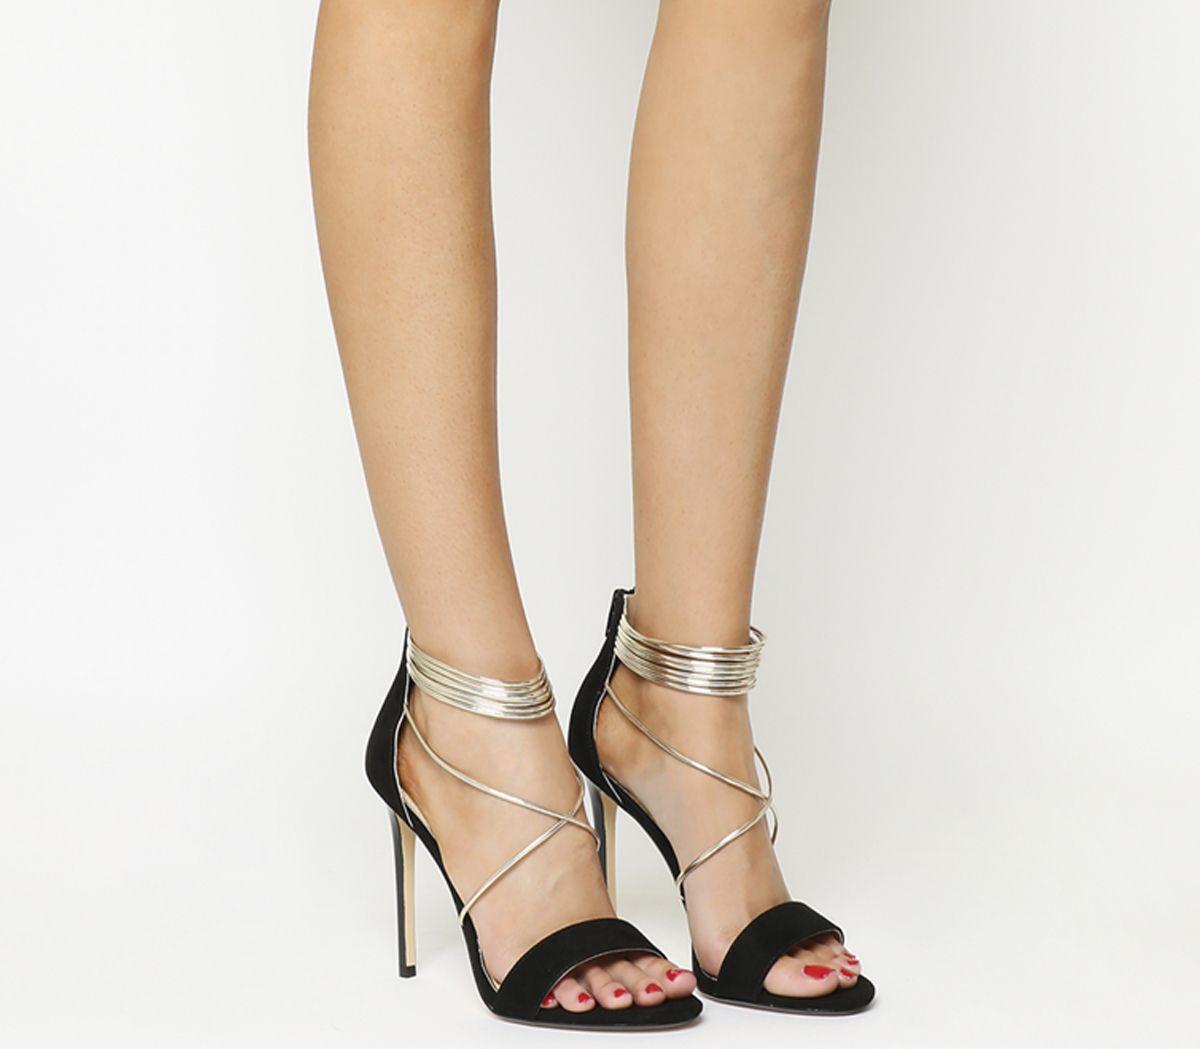 713fbe32bd Office Hollywood Tubular Strap Sandals Black Gold - High Heels